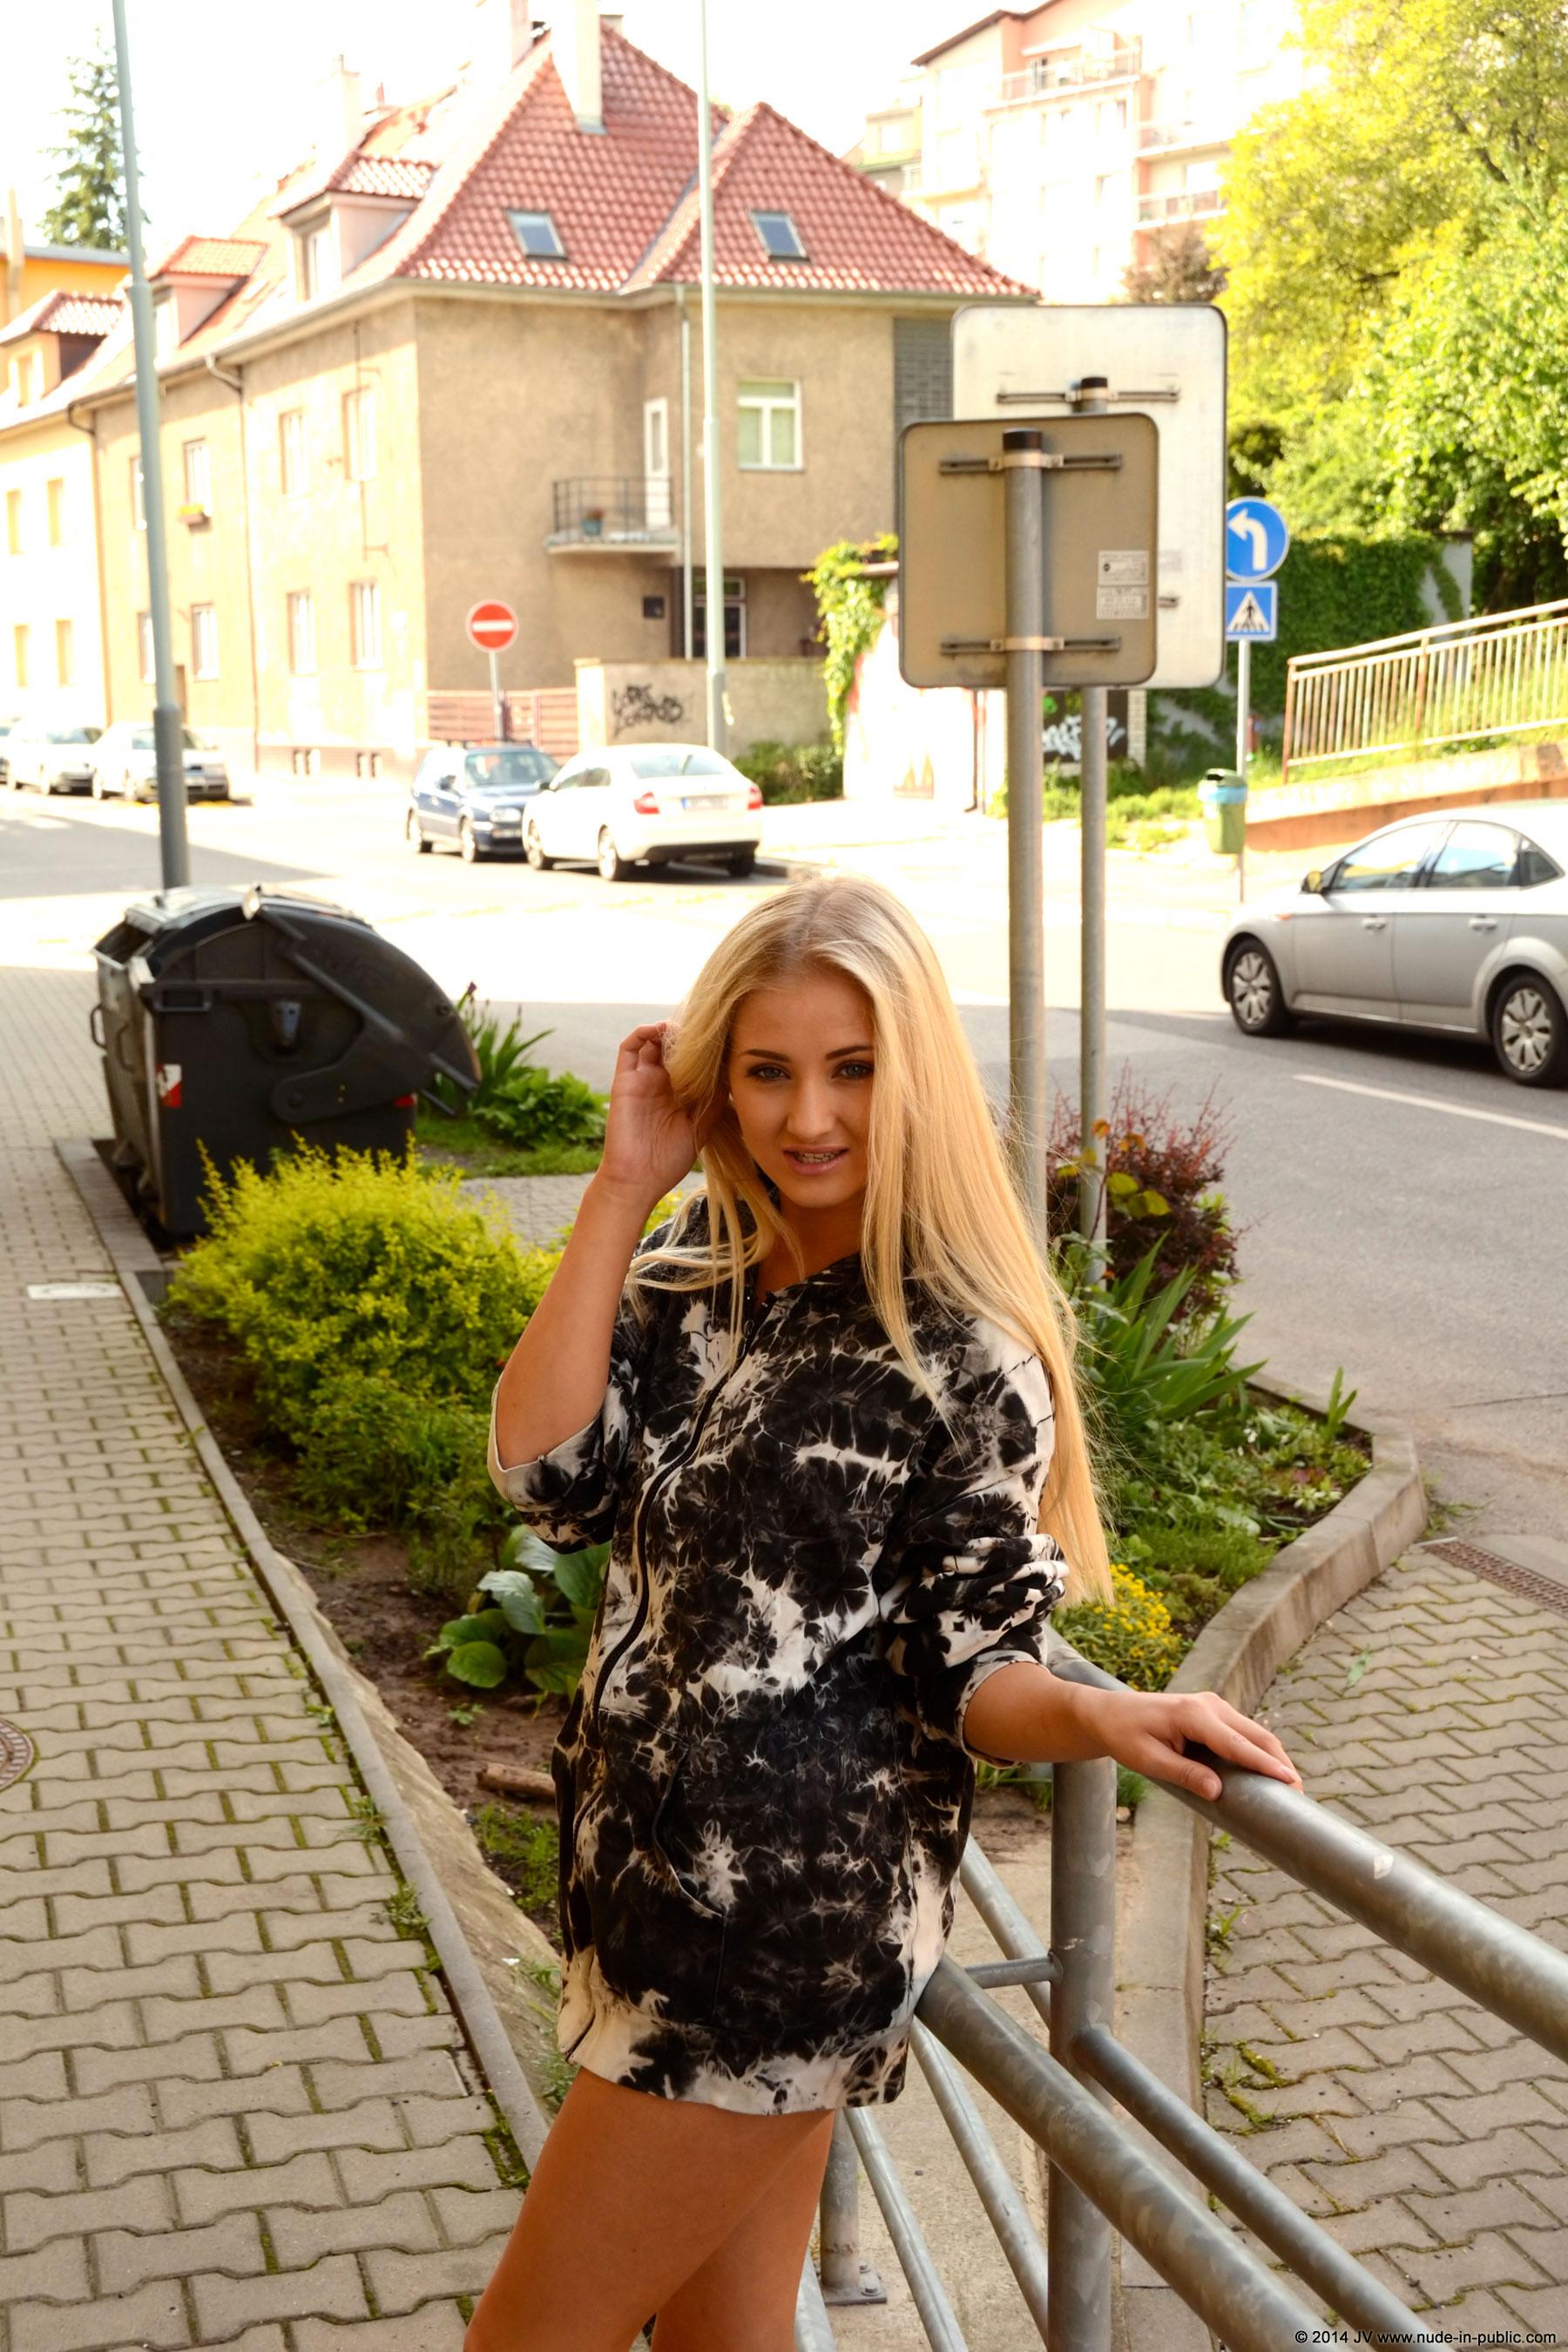 karolina-m-blonde-on-the-street-nude-in-public-07